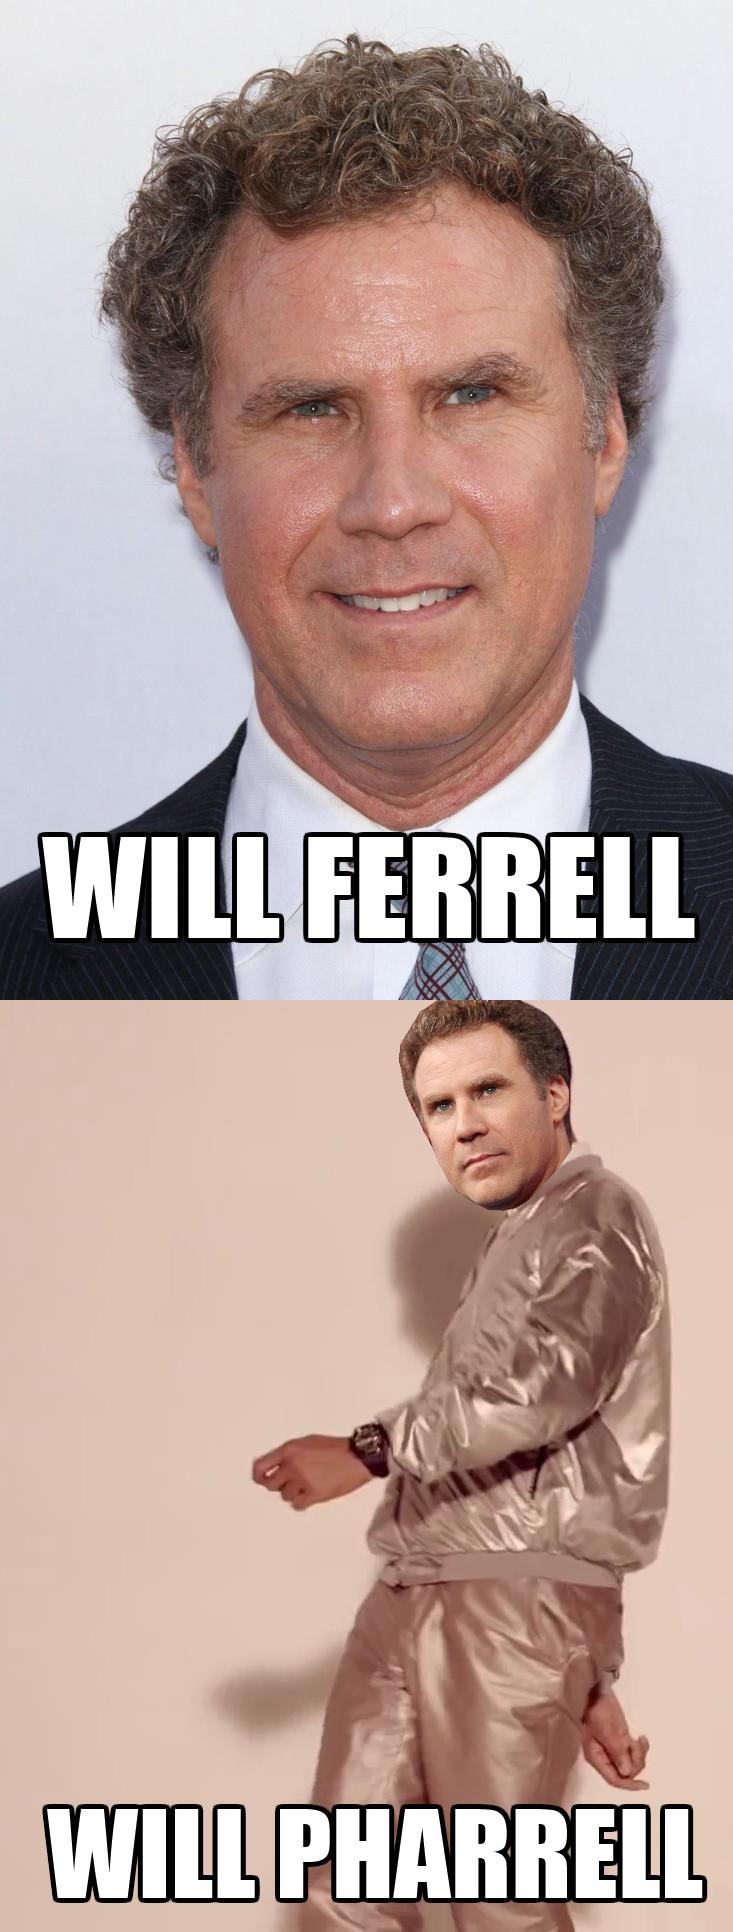 Will Ferrell. Sudden realization.